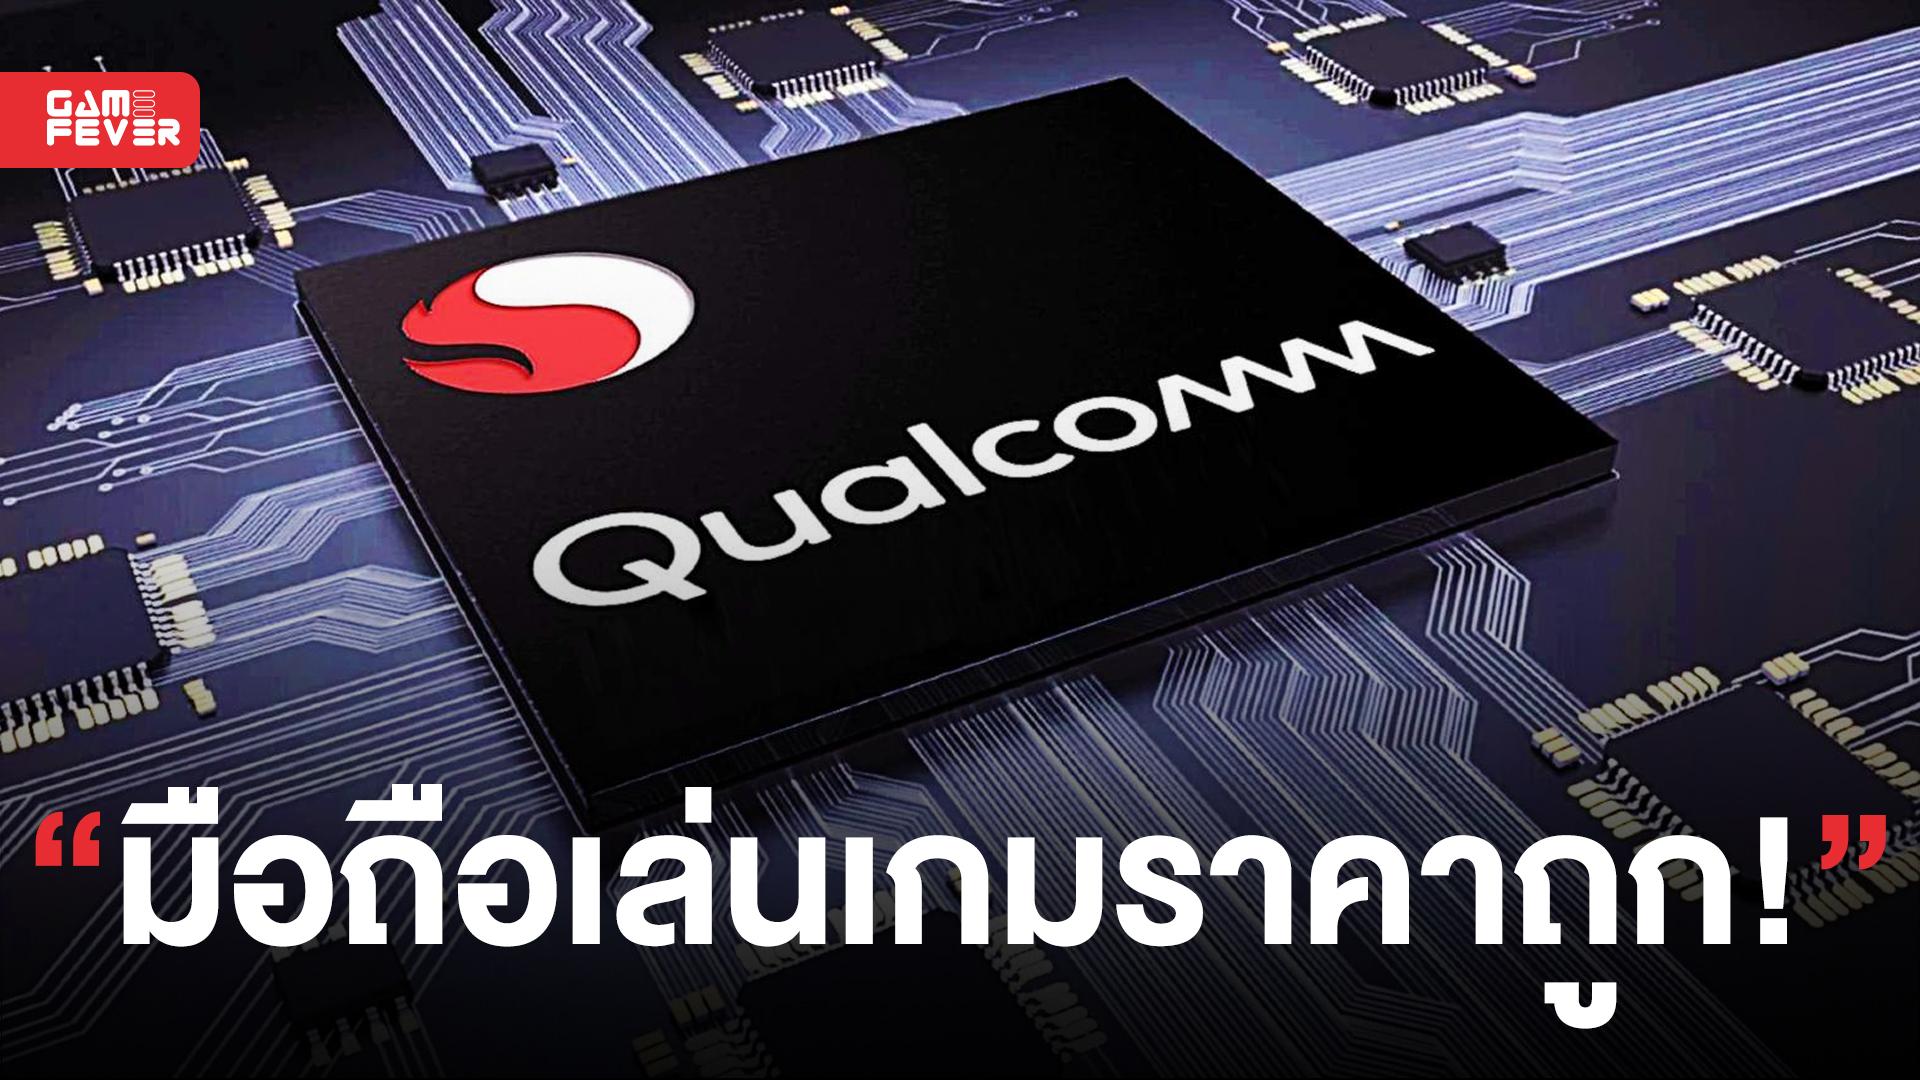 Qualcomm กำลังพัฒนาชิปรุ่นใหม่สำหรับมือถือเล่นเกมราคาไม่แพง